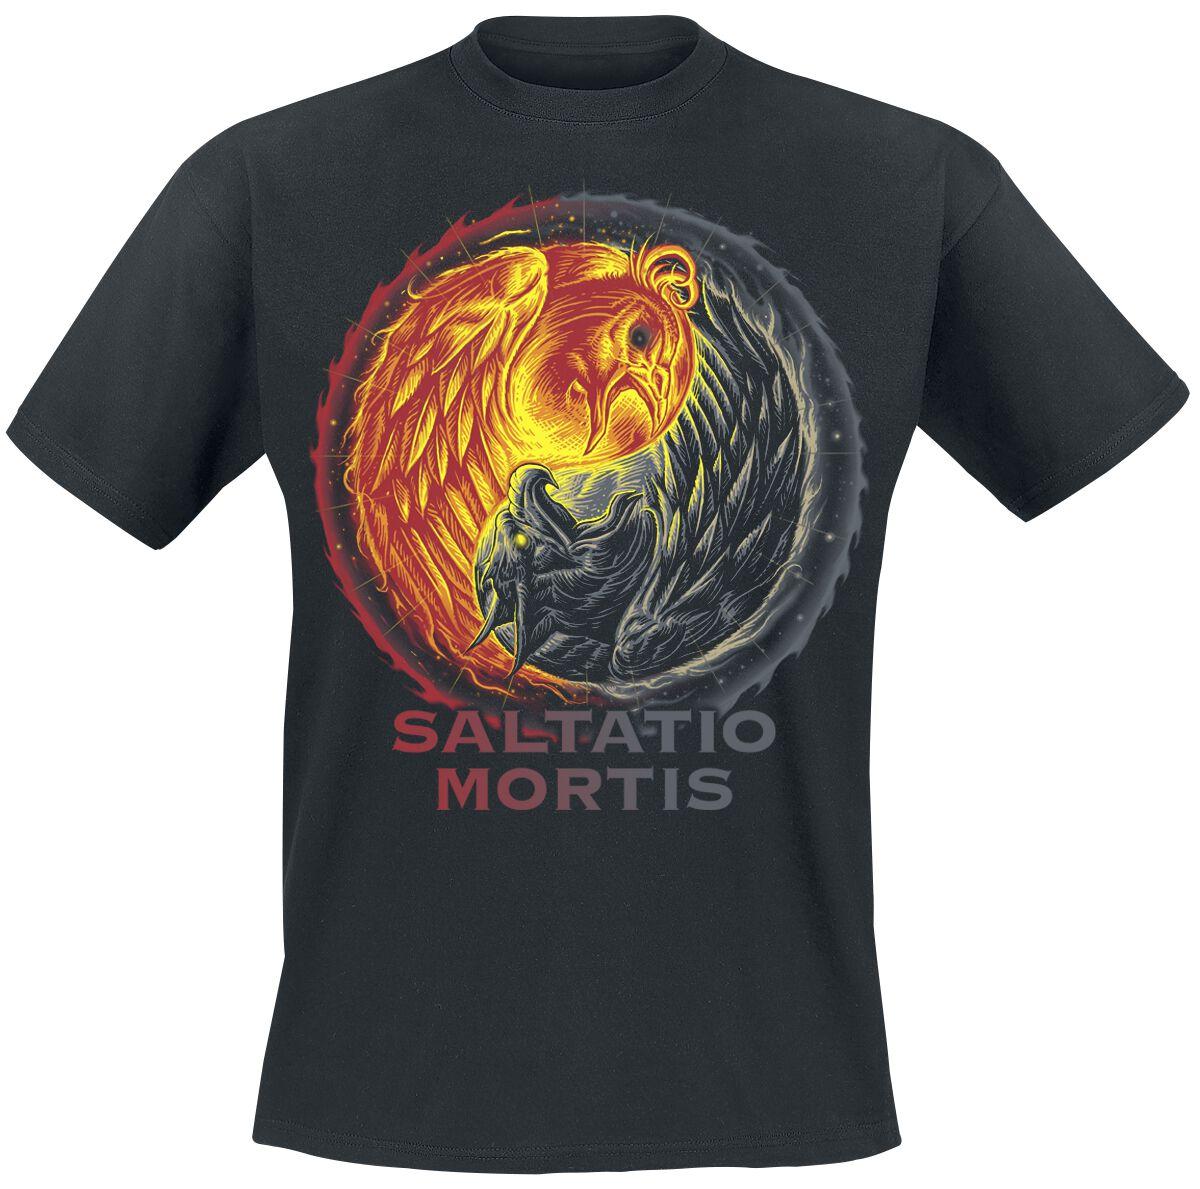 Zespoły - Koszulki - T-Shirt Saltatio Mortis Yin Yang T-Shirt czarny - 376023